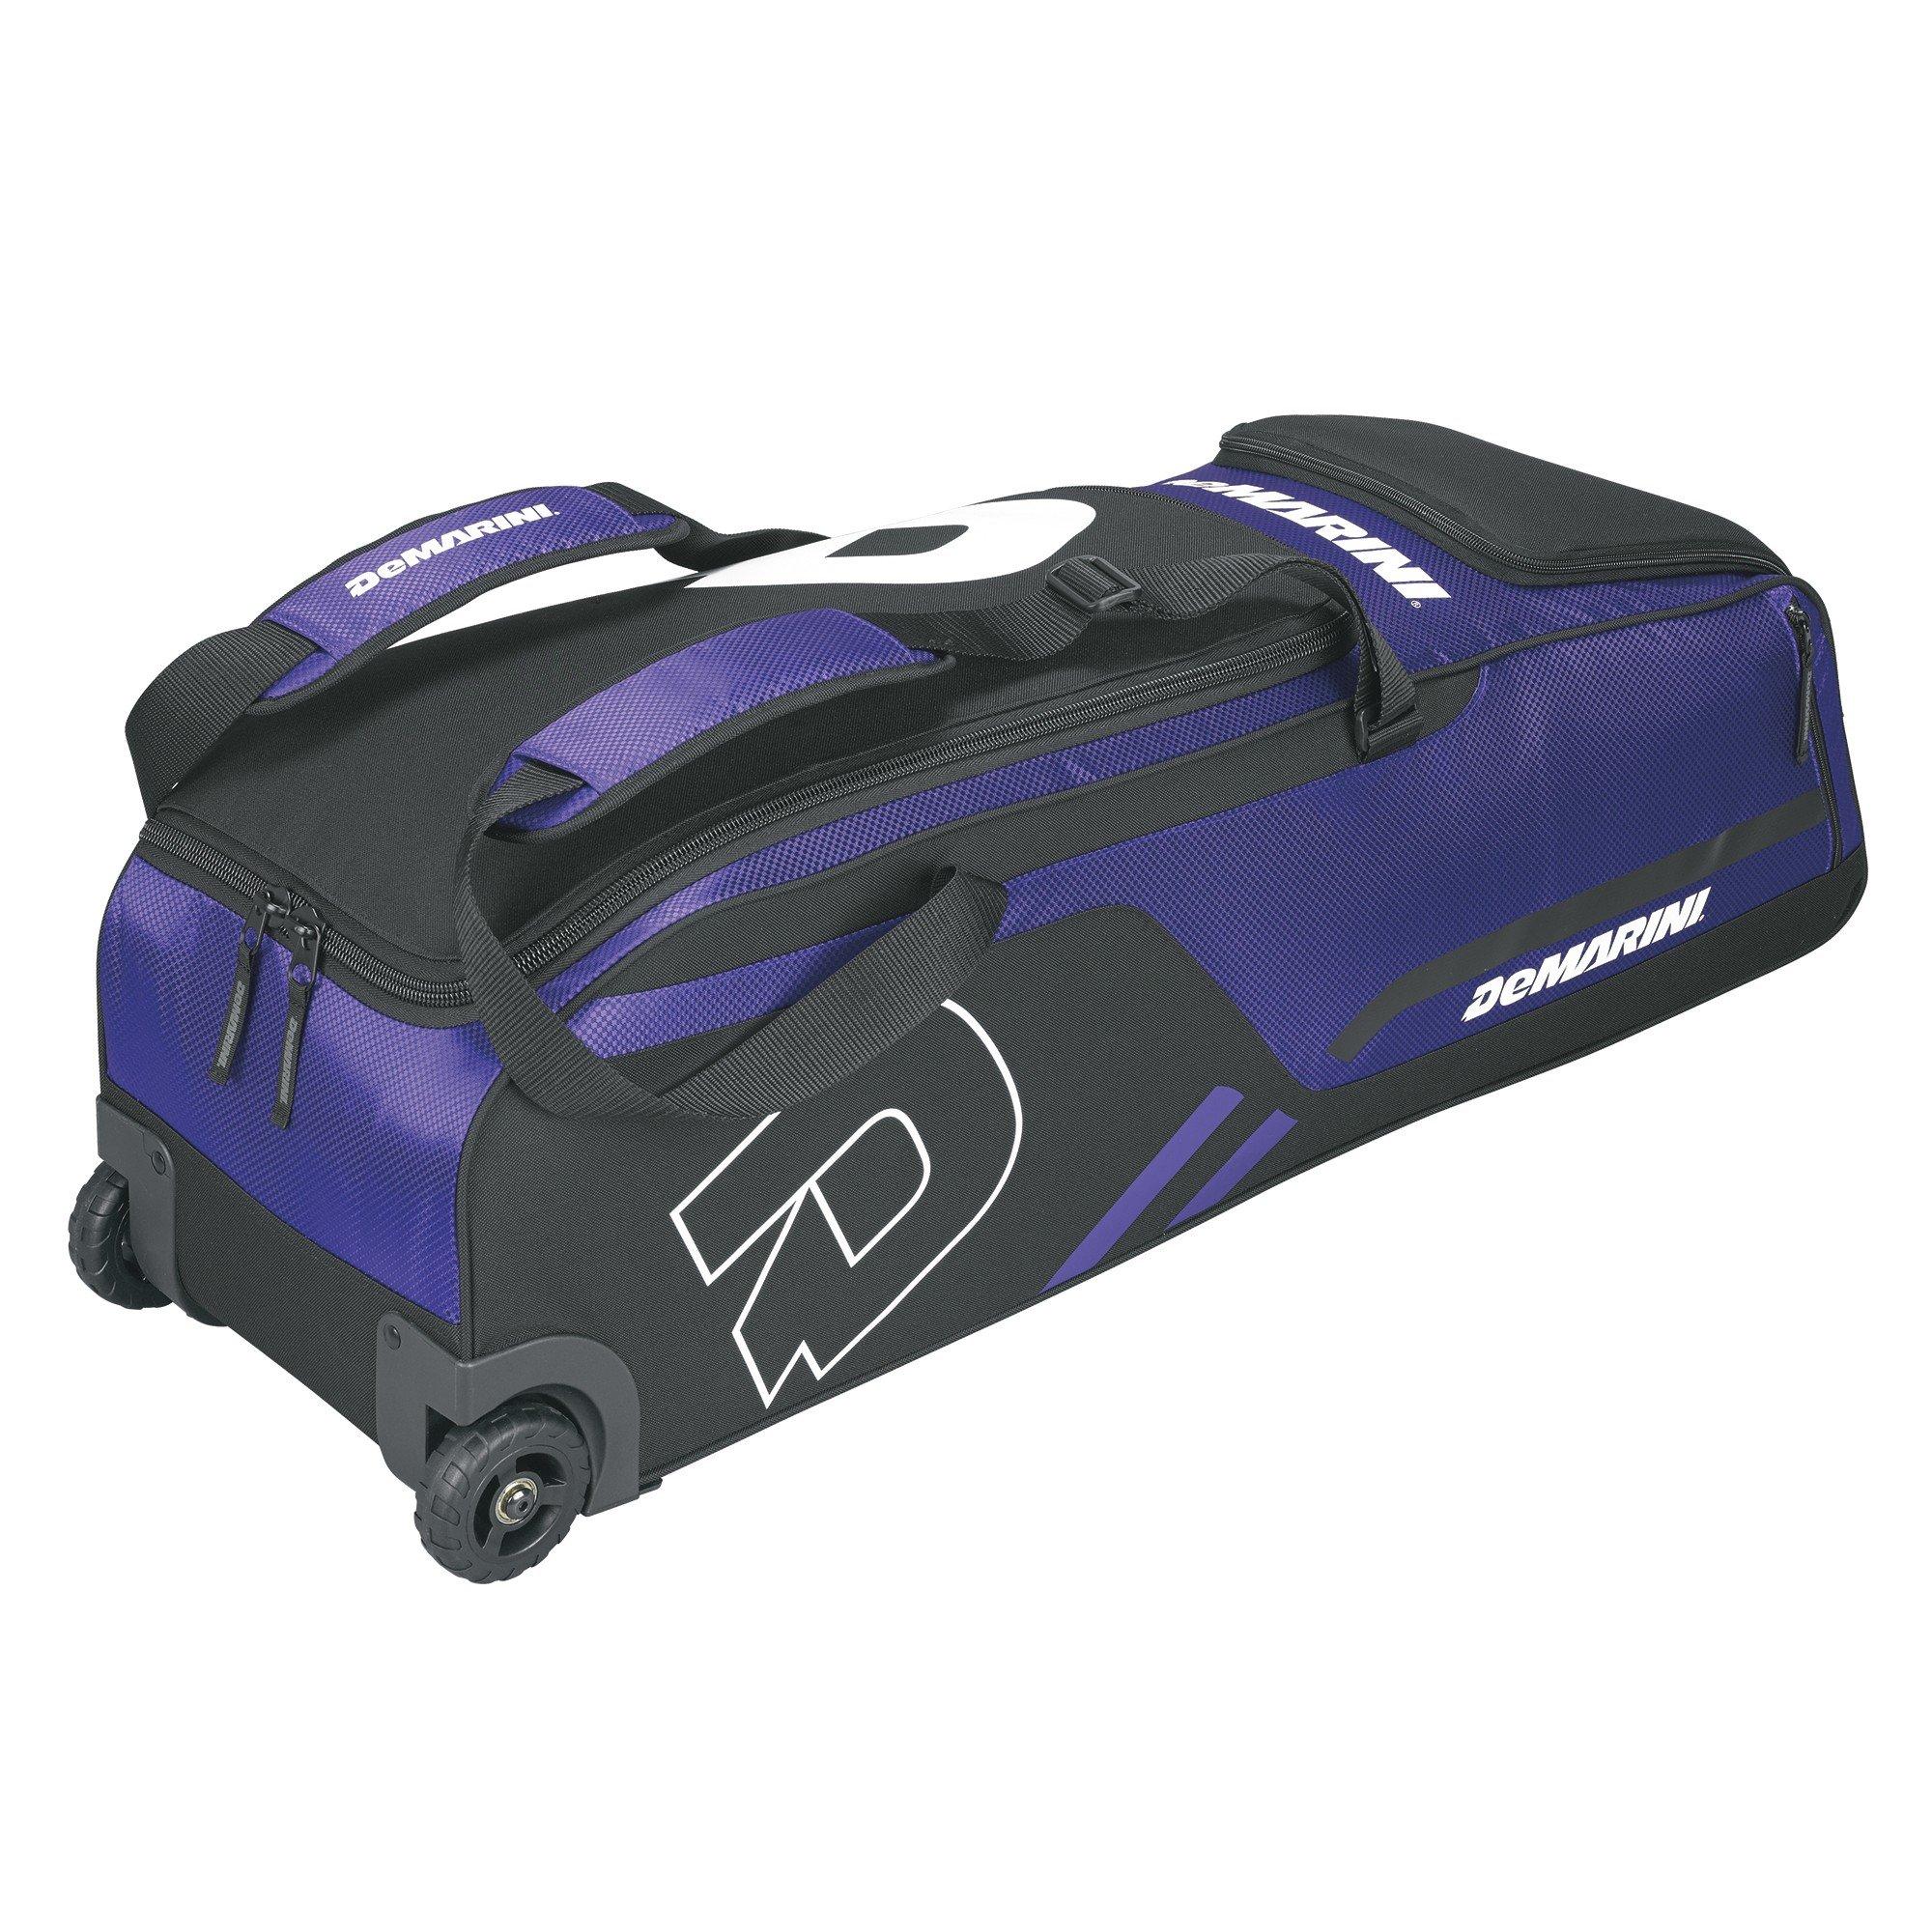 DeMarini Momentum Wheeled Bag, Purple by DeMarini